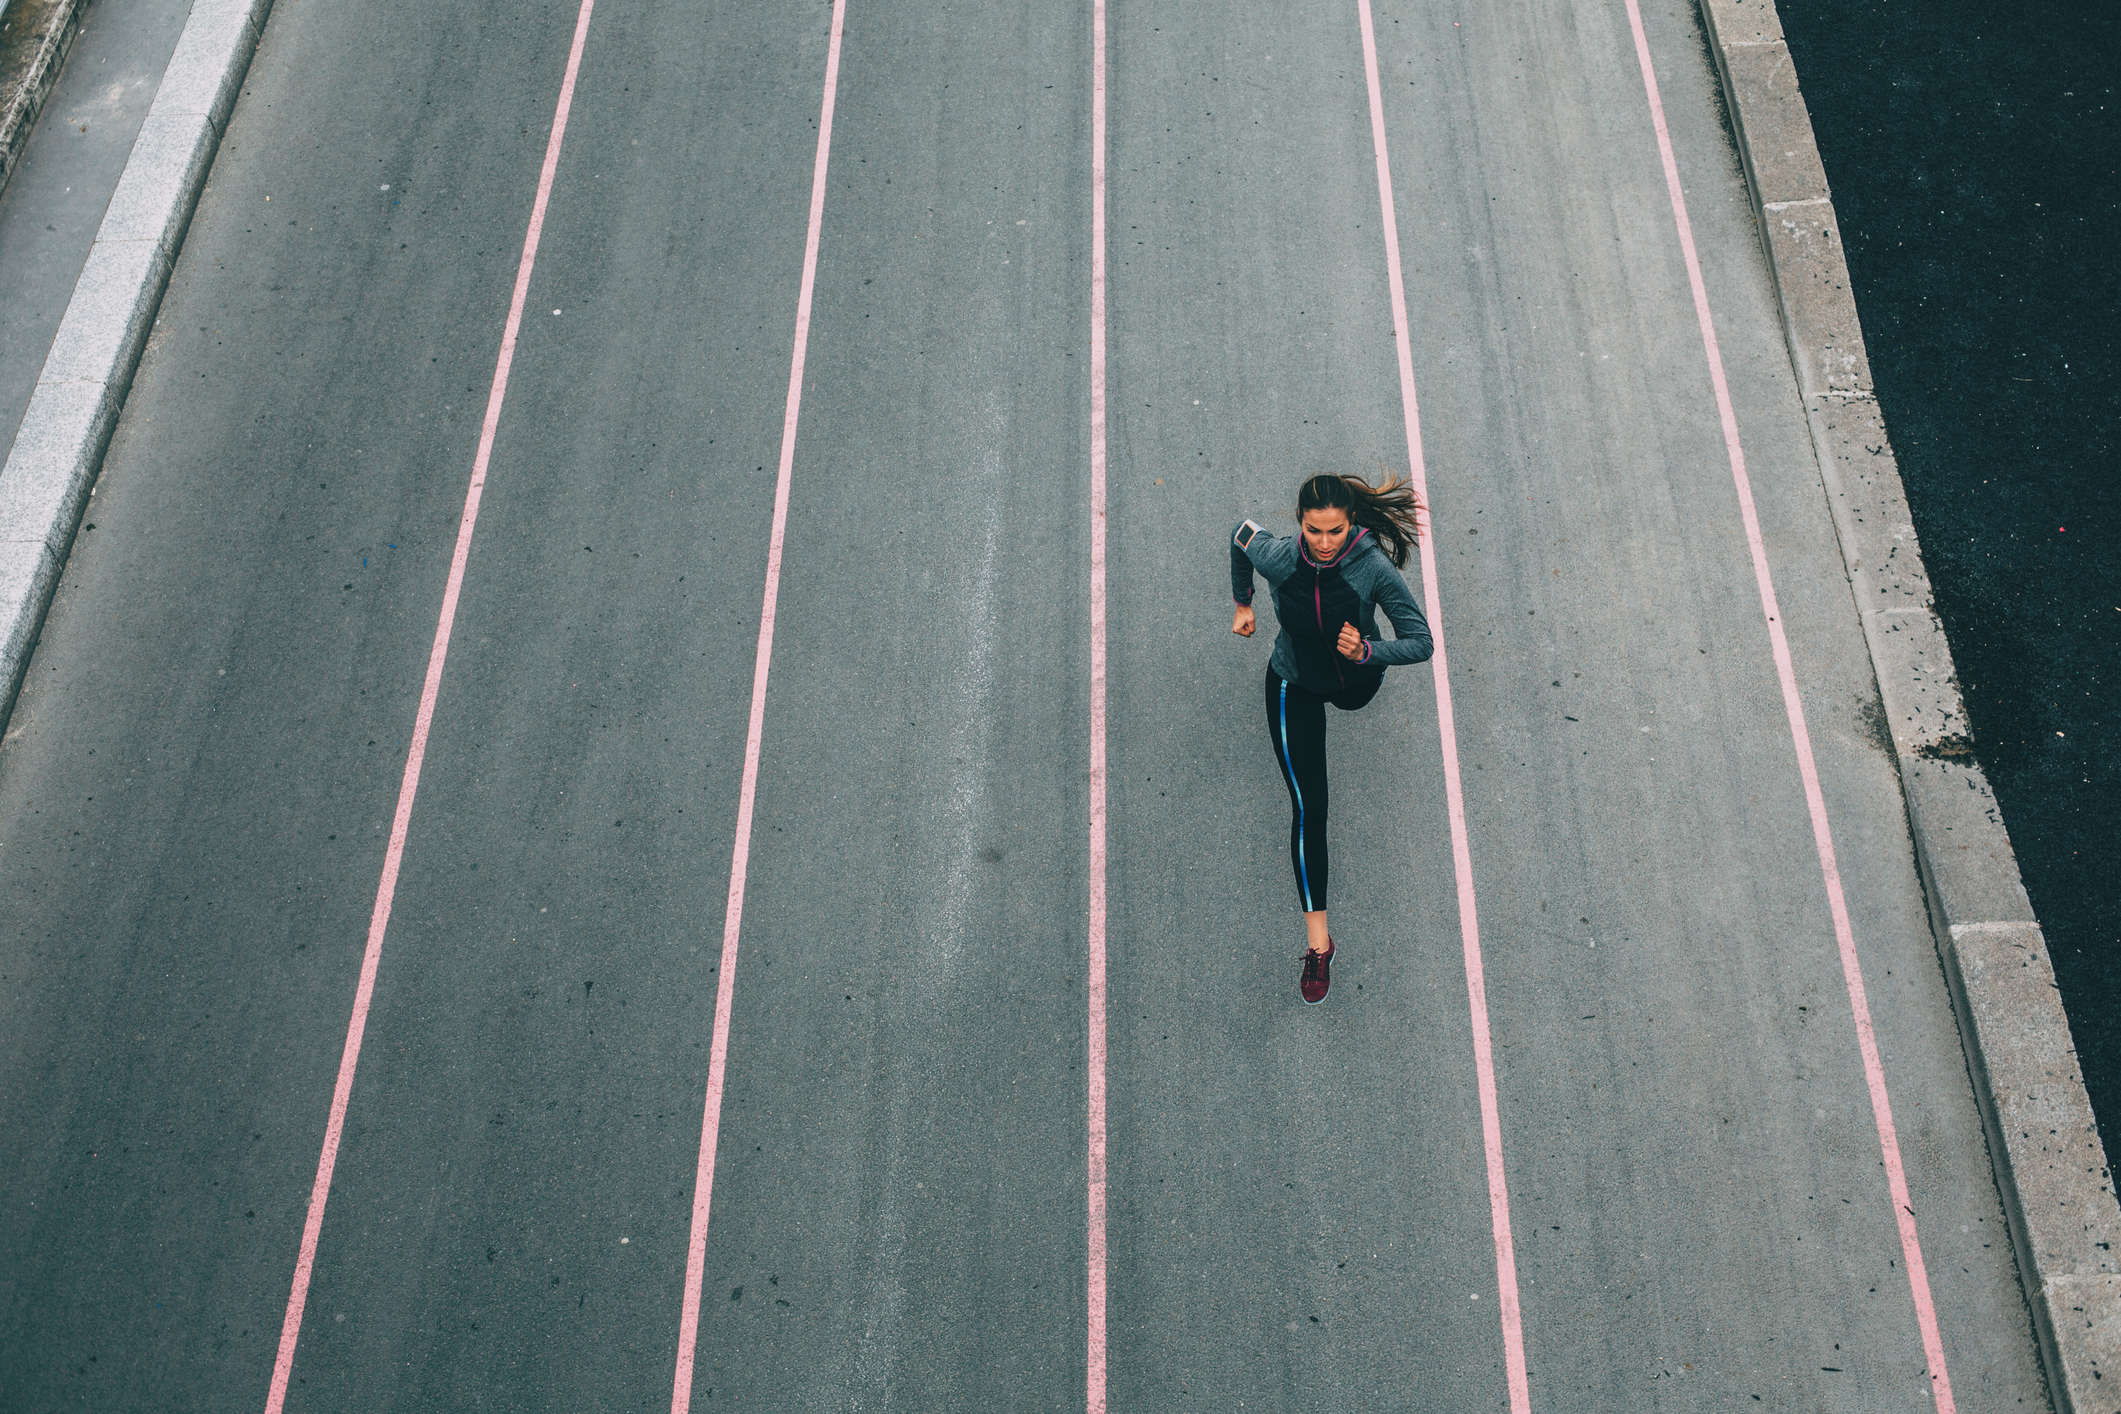 woman-training-menstrual-cycle